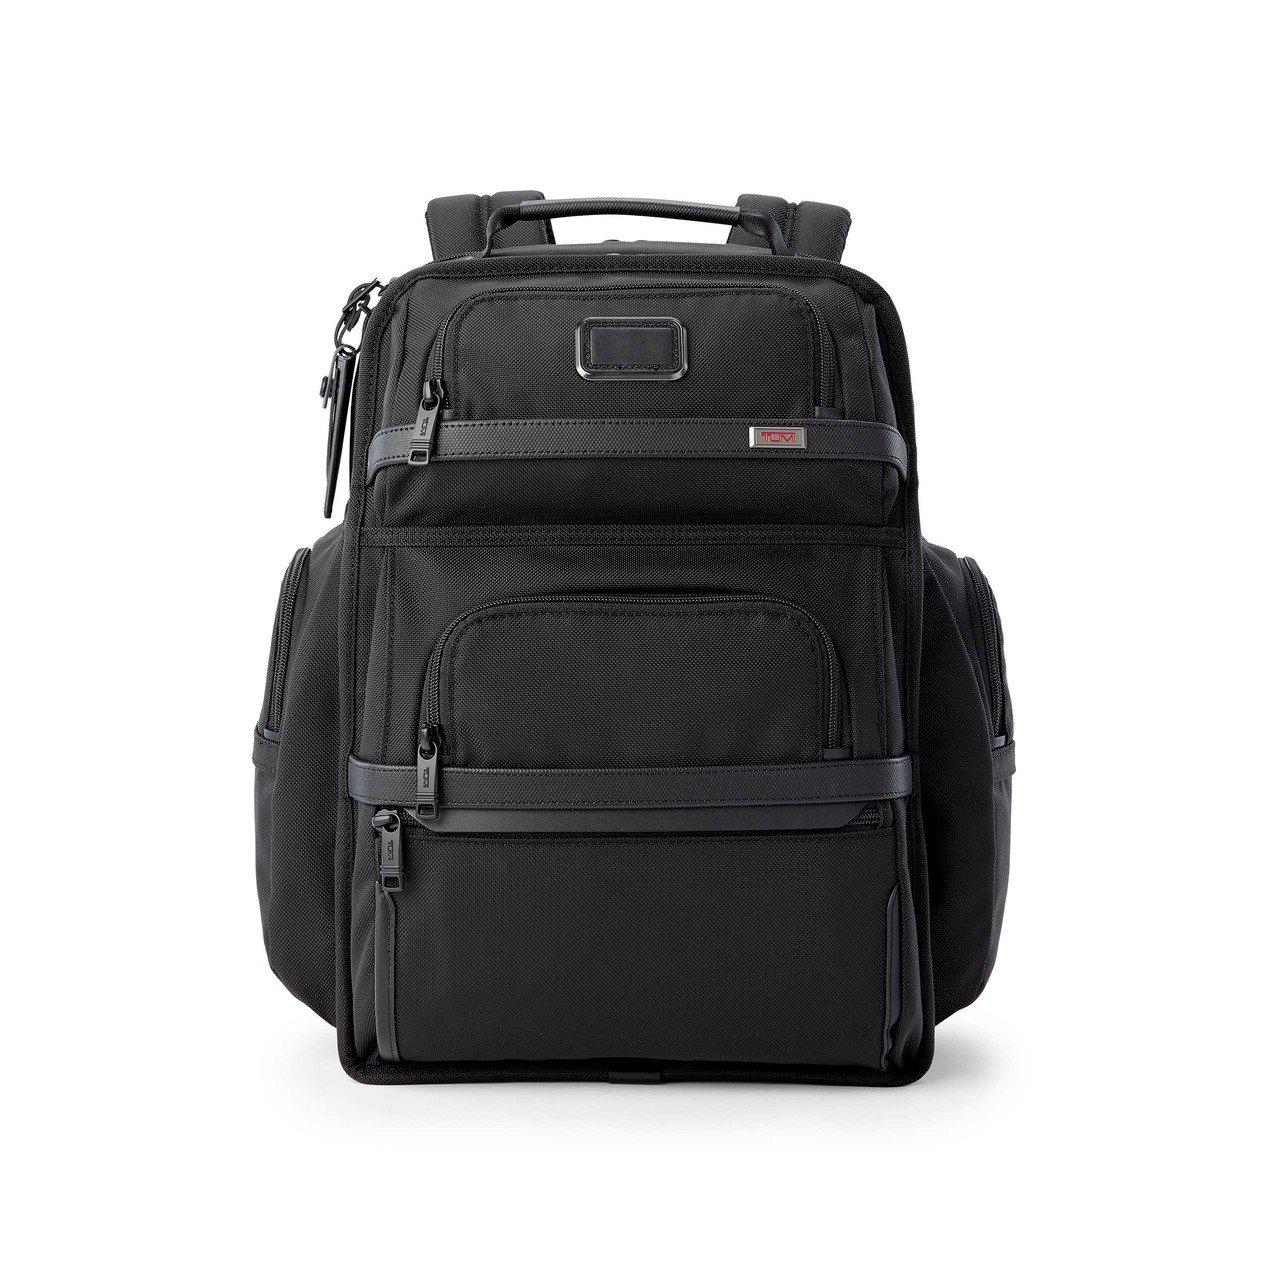 TUMI Alpha 3系列公事後背包22,400元。圖/TUMI提供